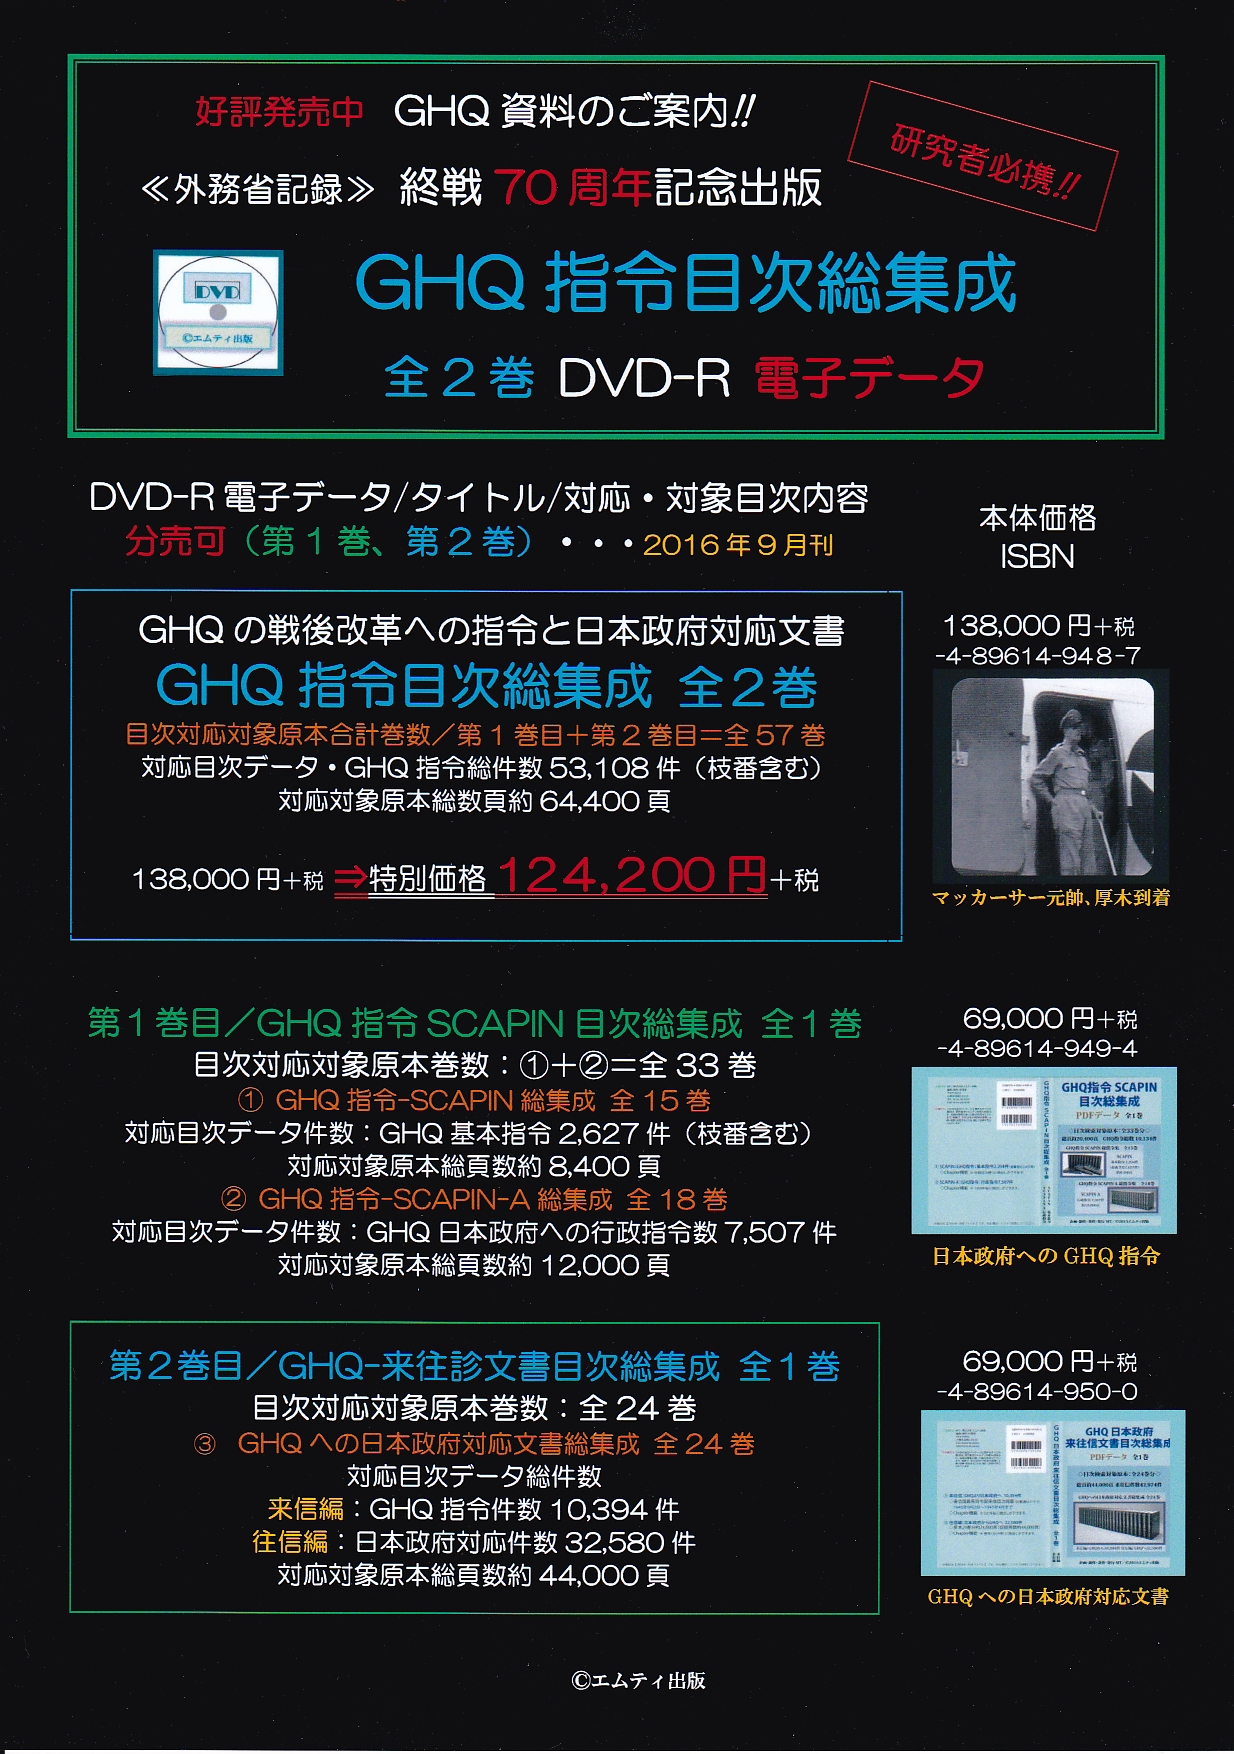 GHQ指令表1